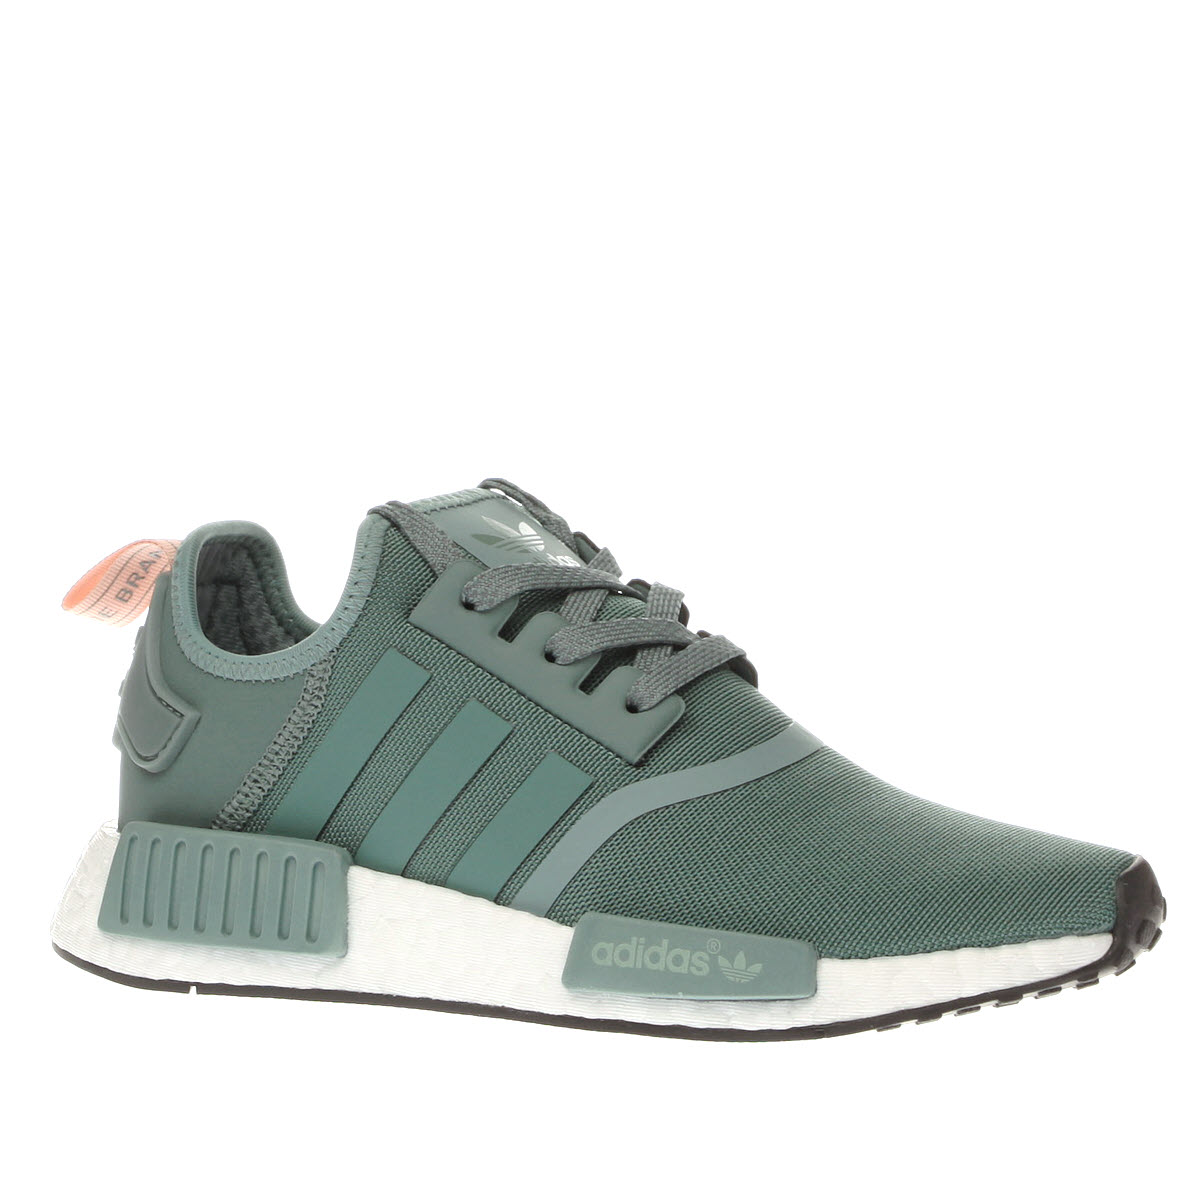 adidas khaki womens trainers Sale  b854b9774c